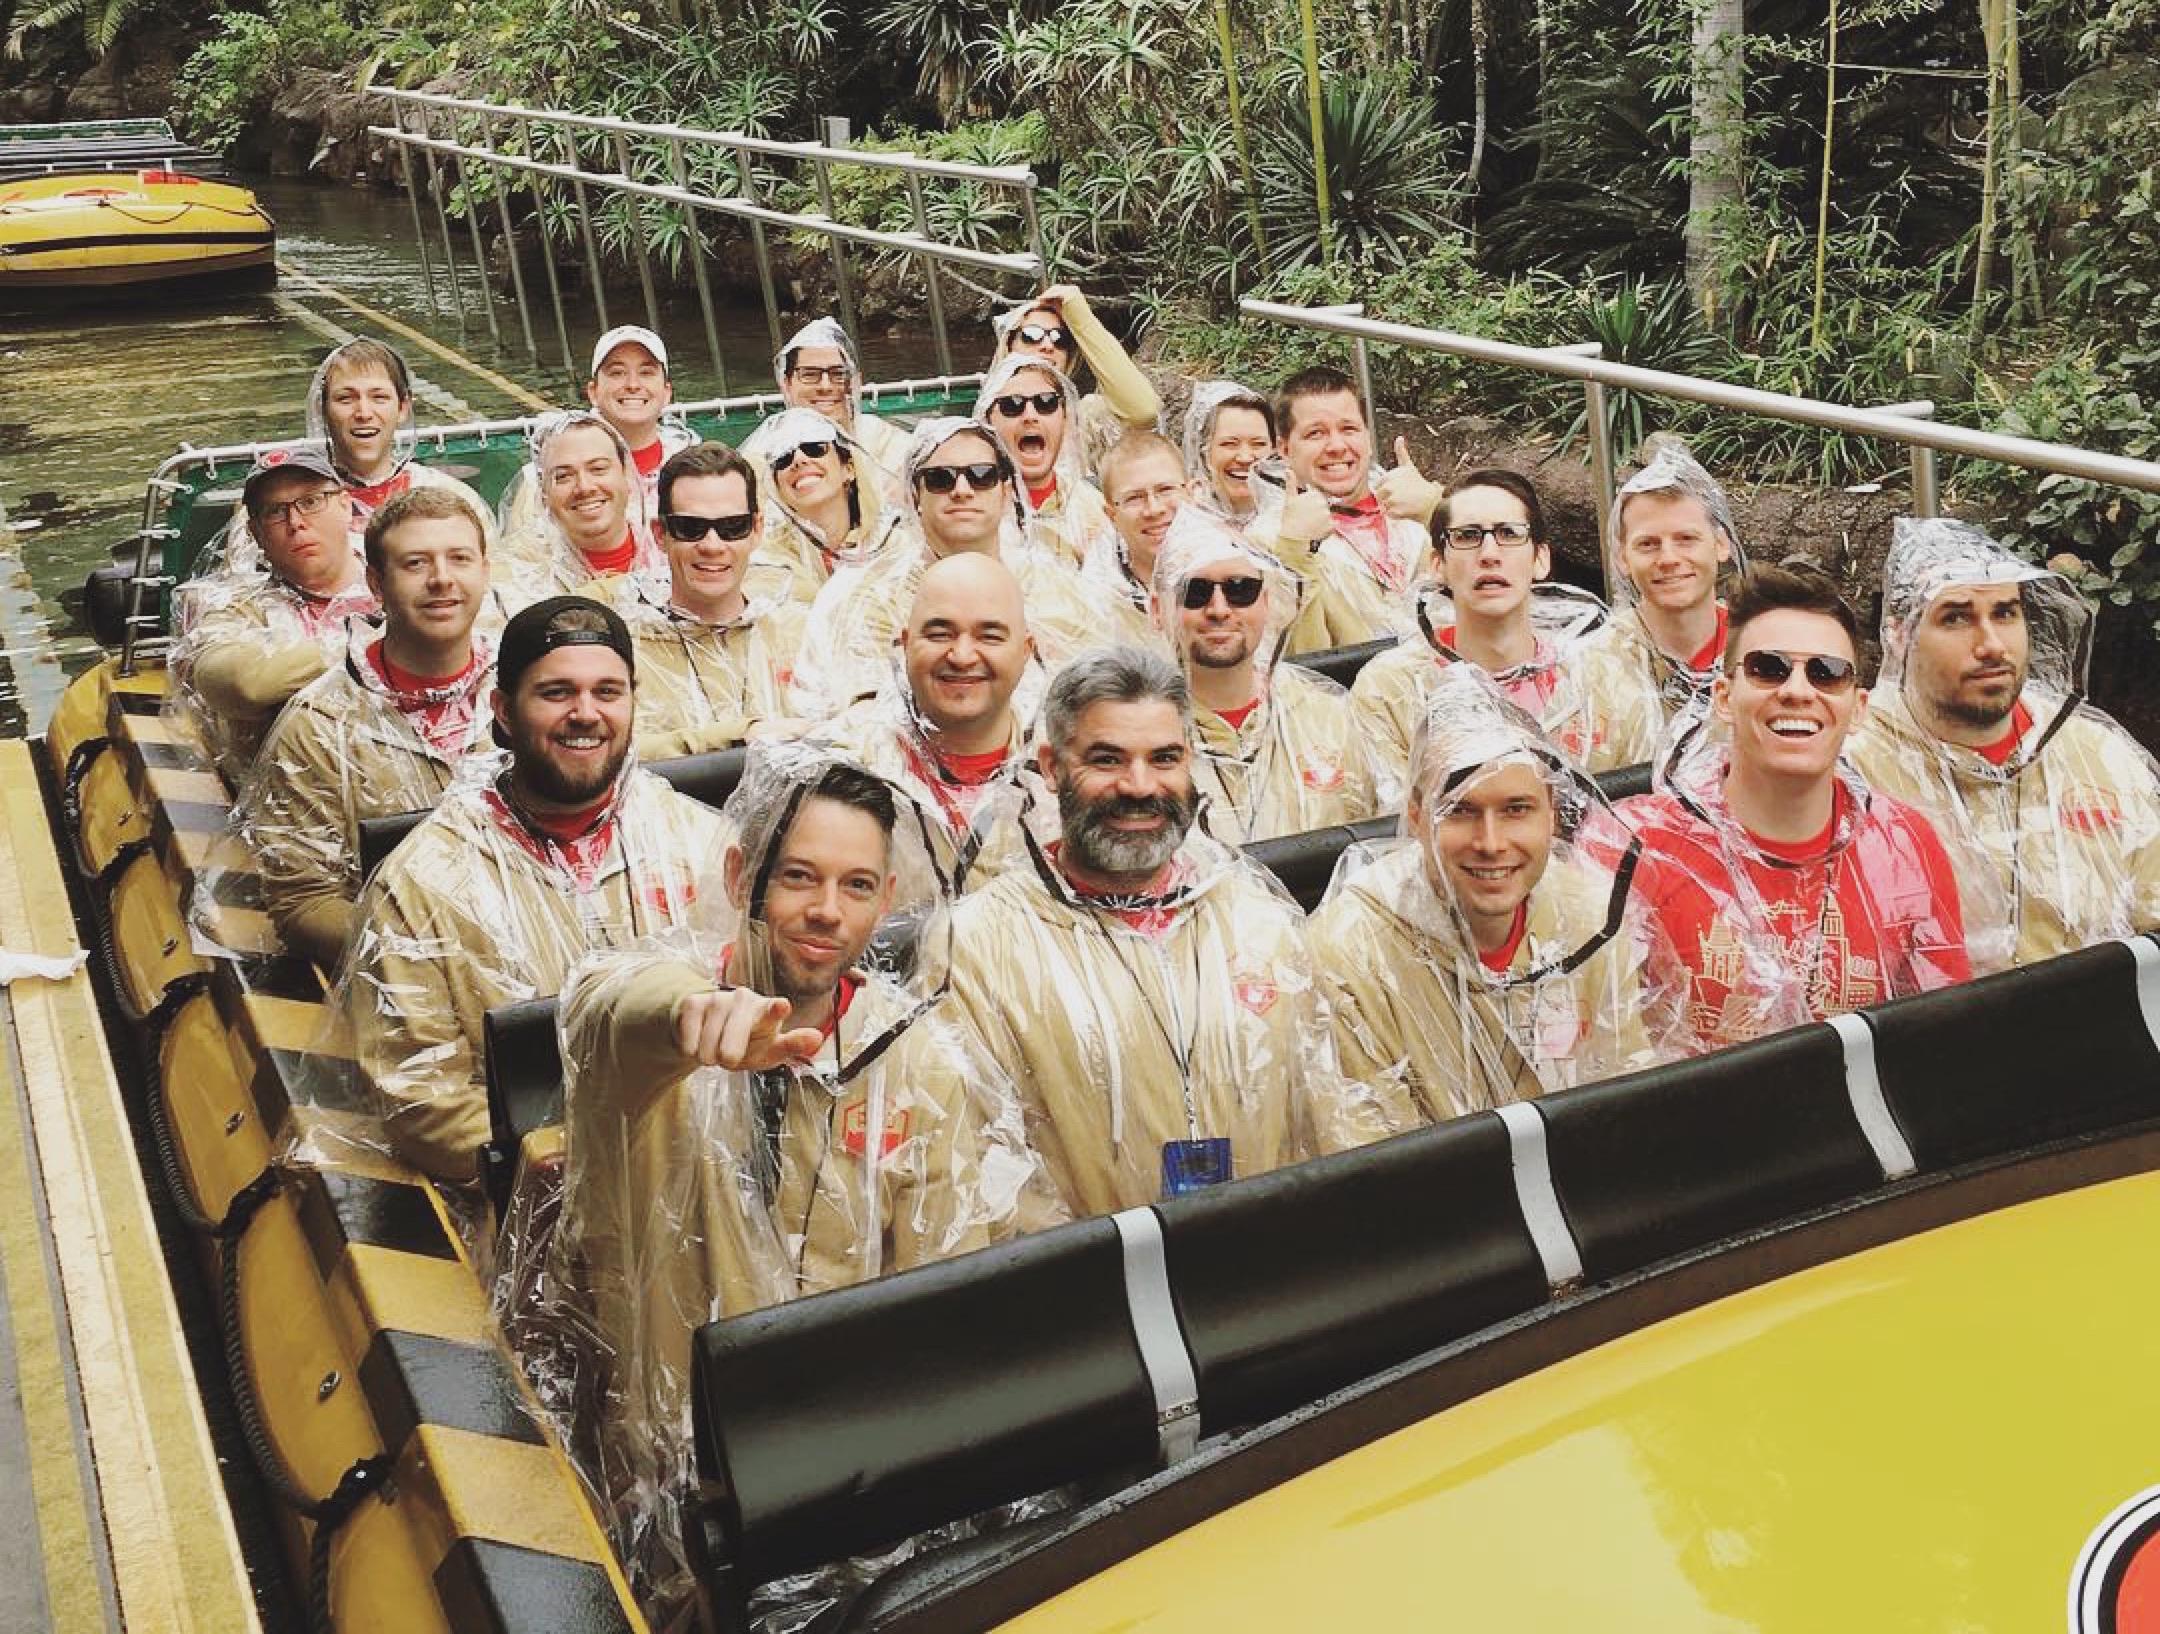 Jurassic Park Log Ride